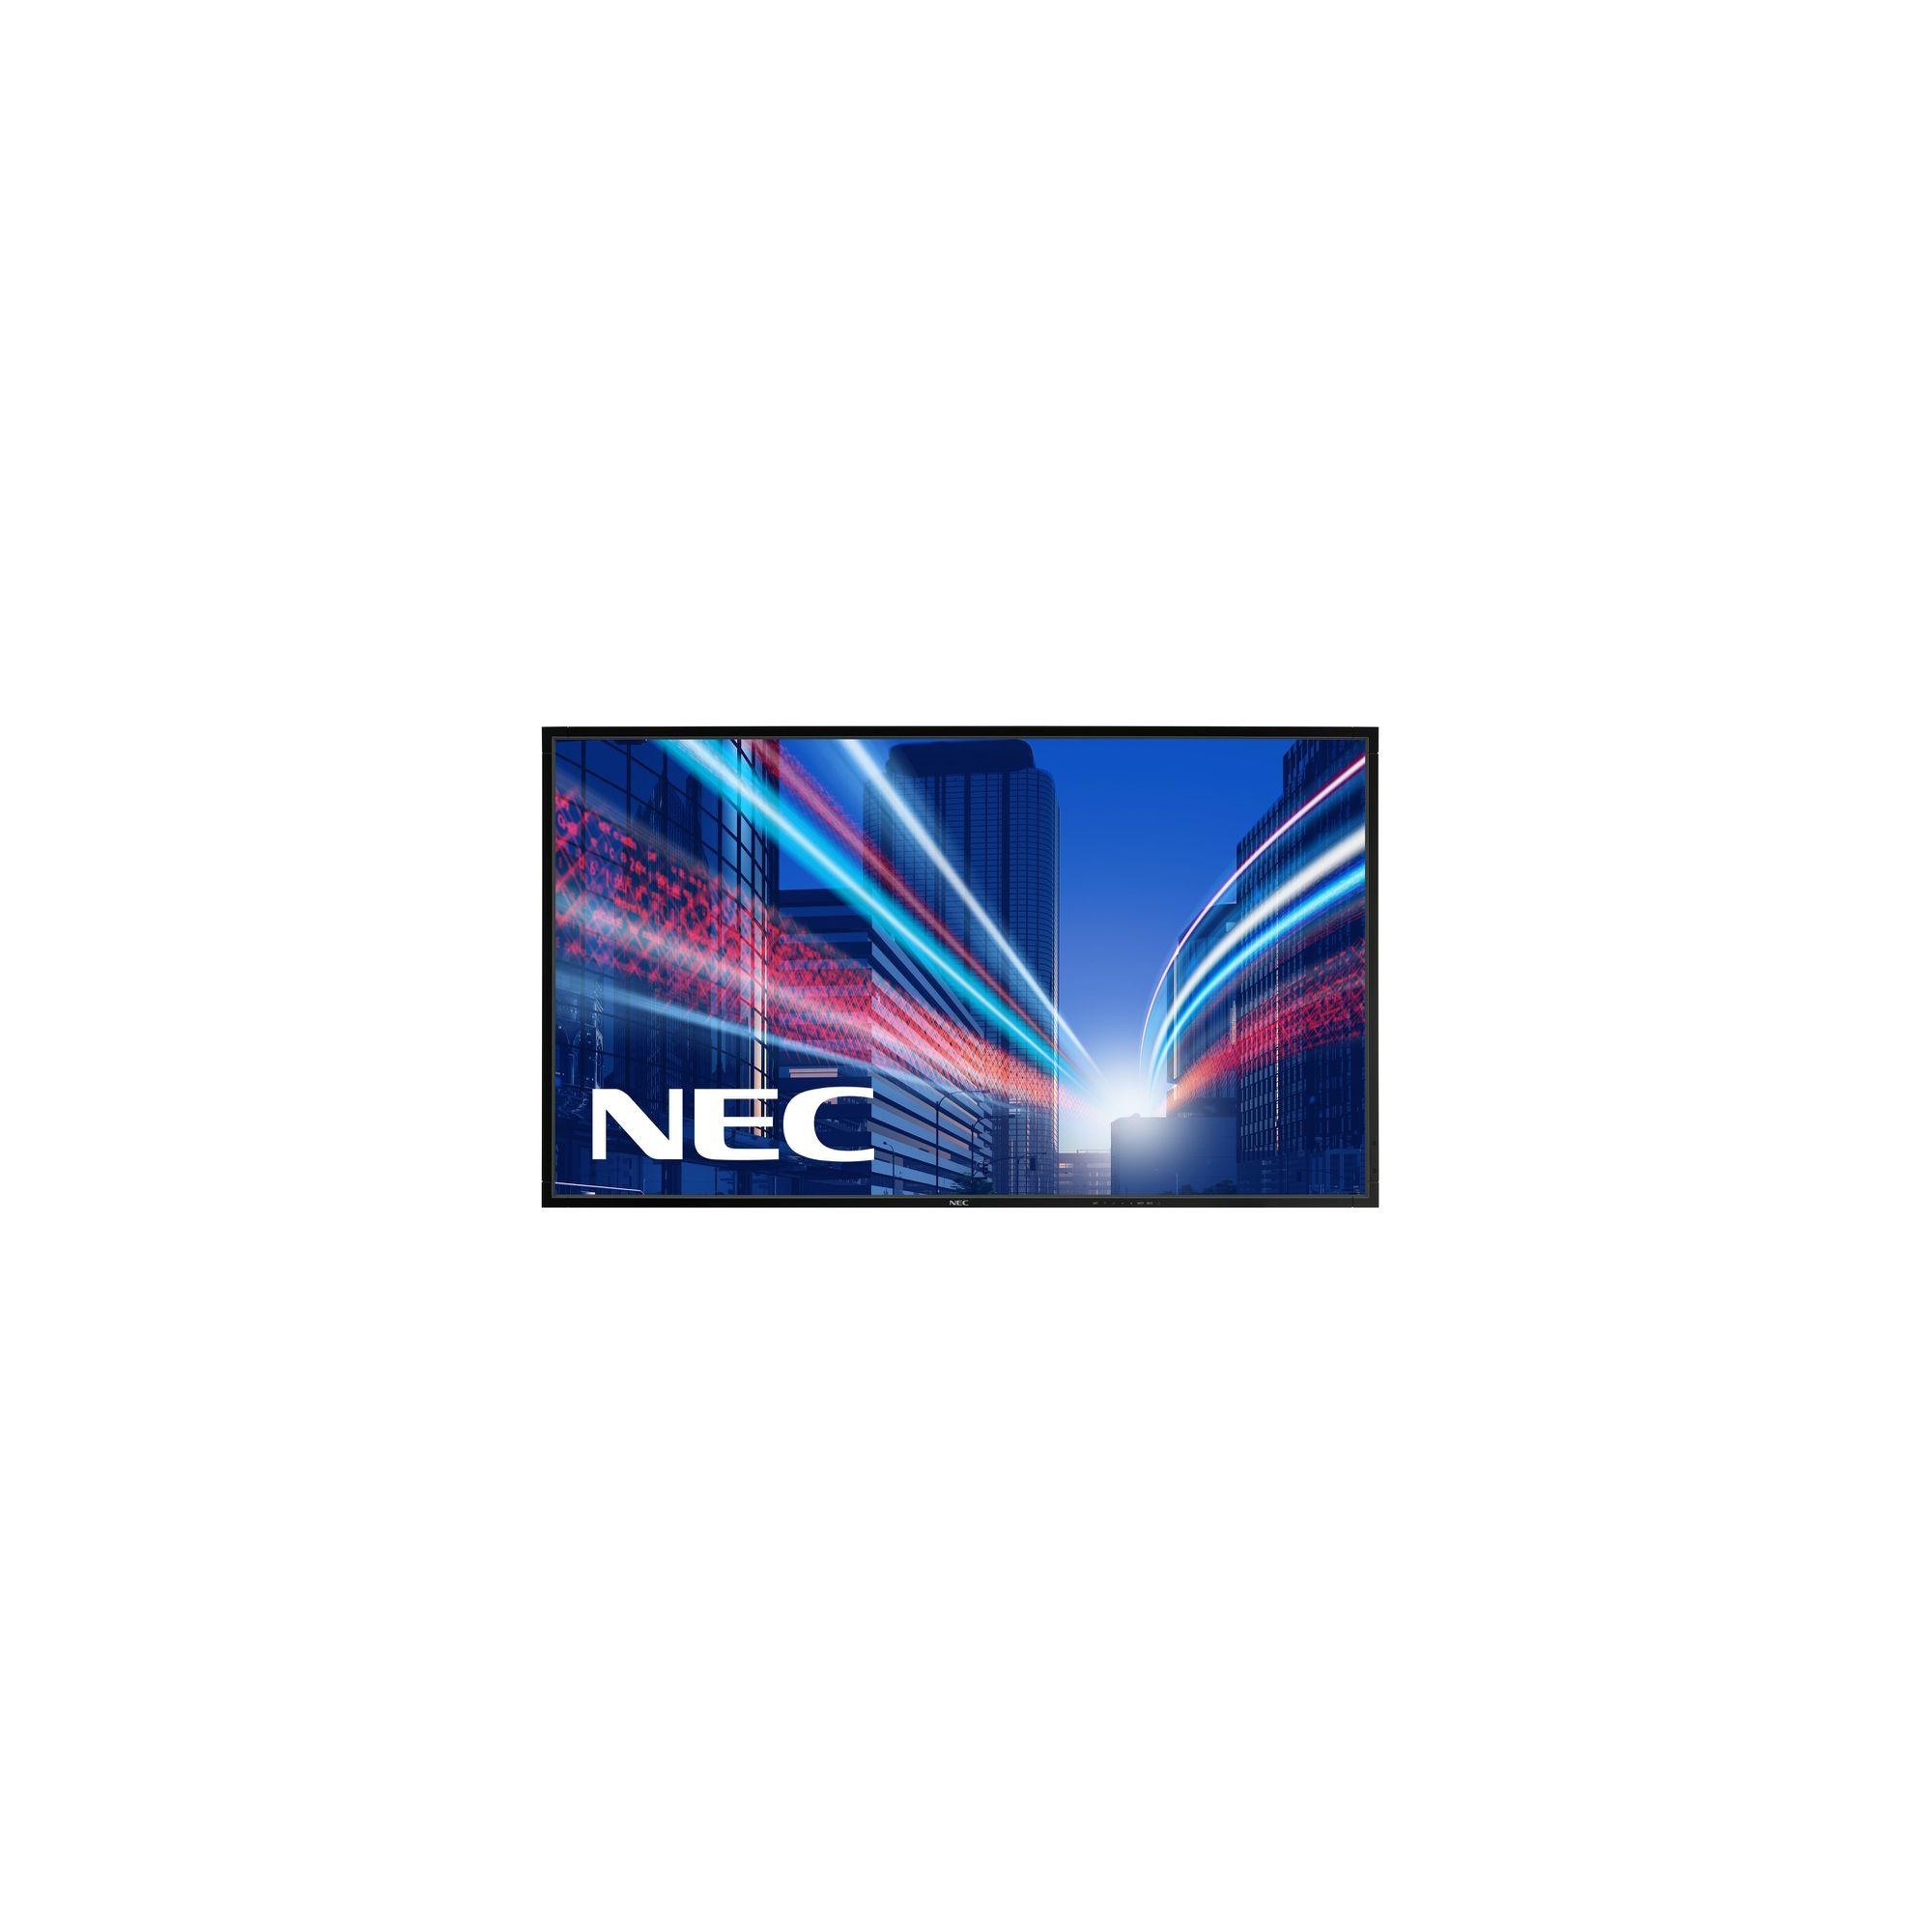 NEC 60003174 Displays MultiSync X462HB 46 inch Public Display